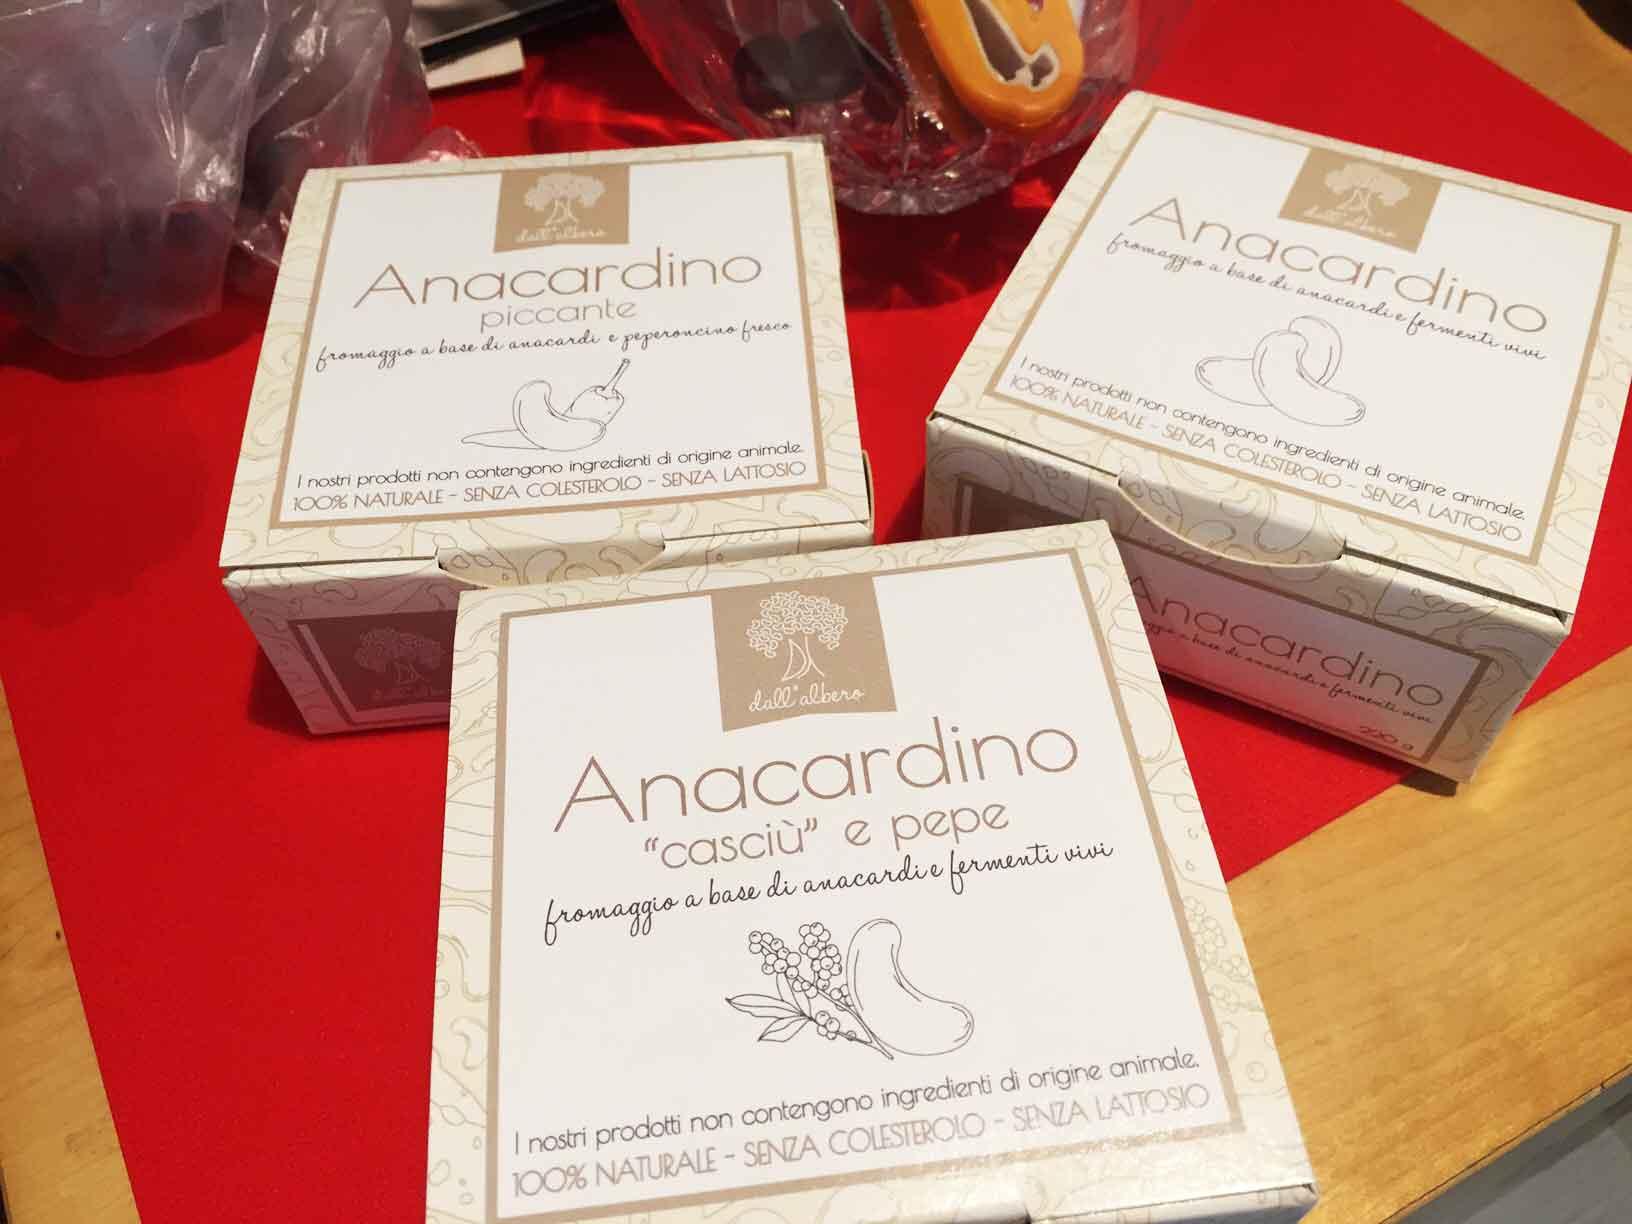 anacradino-formaggi-roma-dall-albero